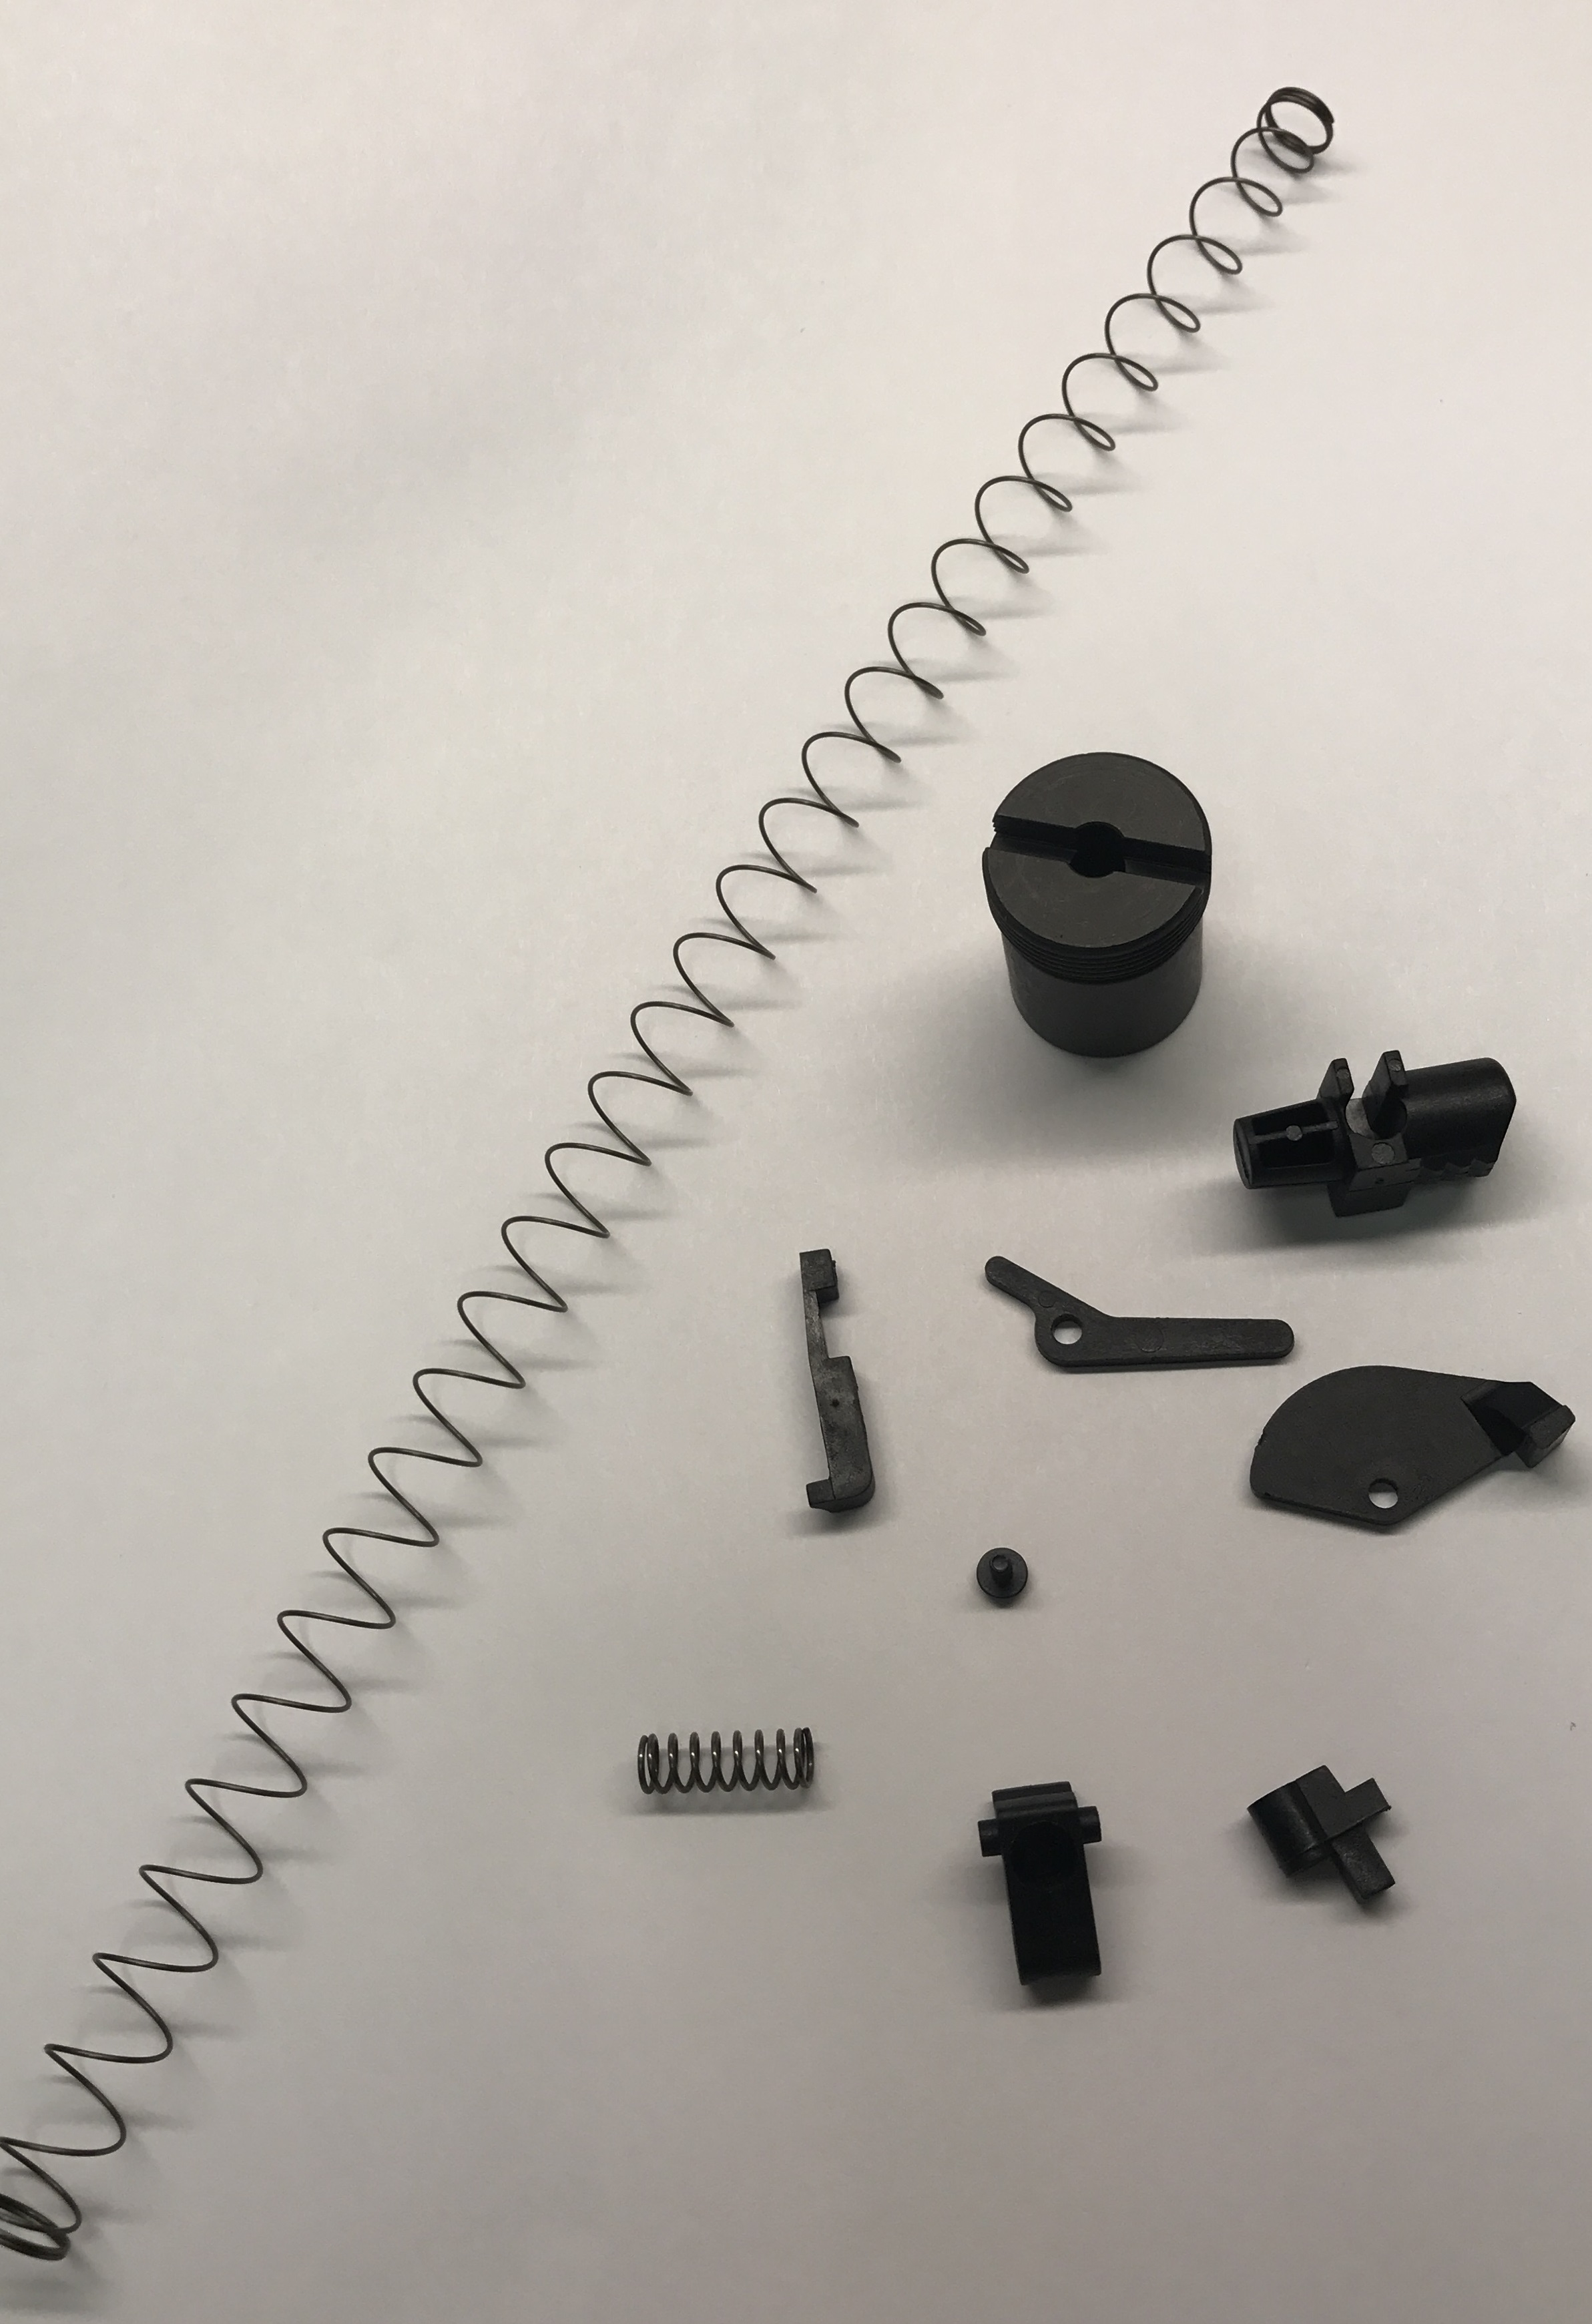 T4E TM-4/HK 416 Airsoft Training Rifle Magazine Component Kit